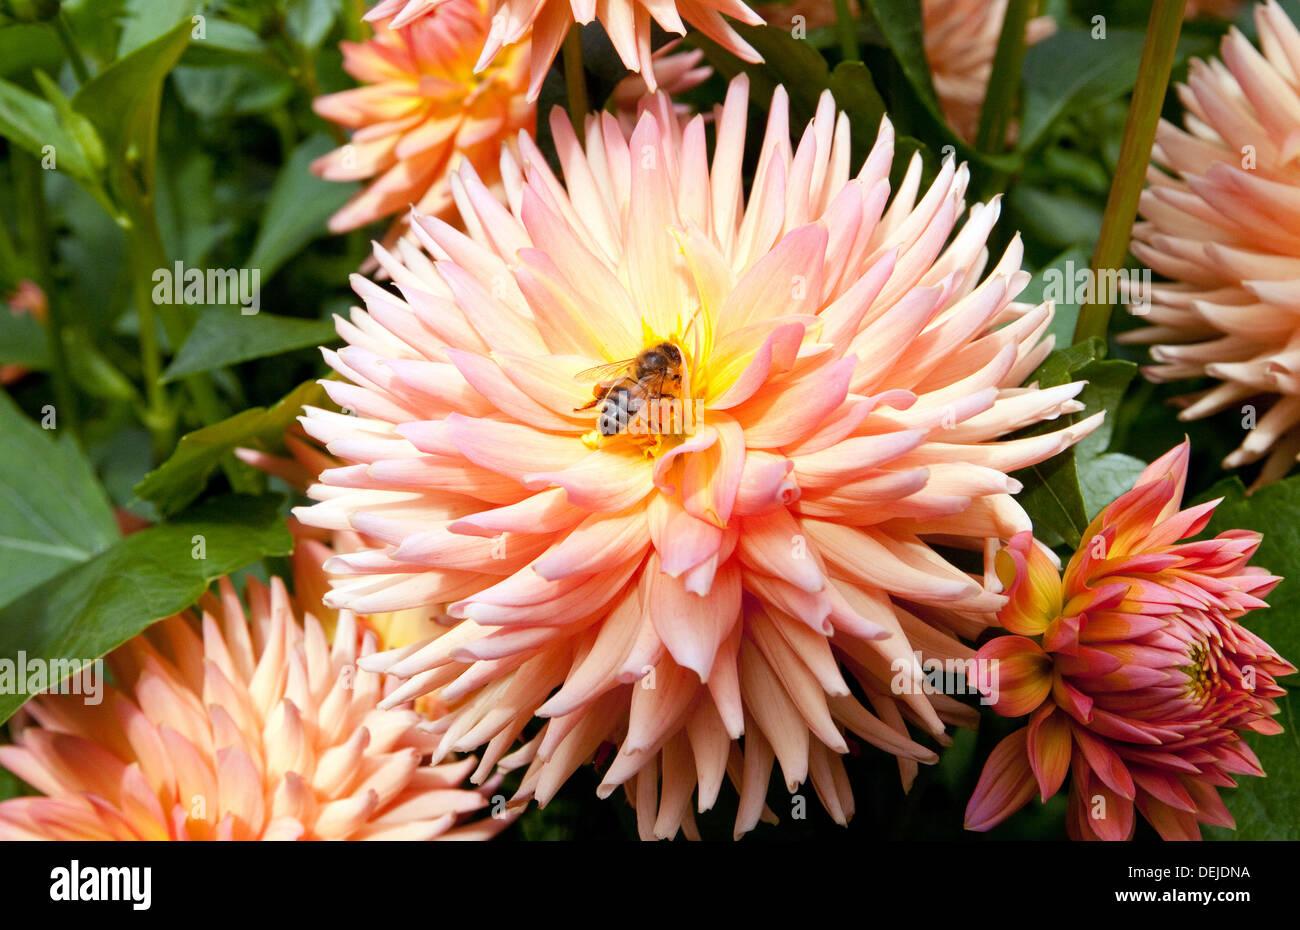 Honey Bee on dahlia flower, Cambridgeshire, UK - Stock Image